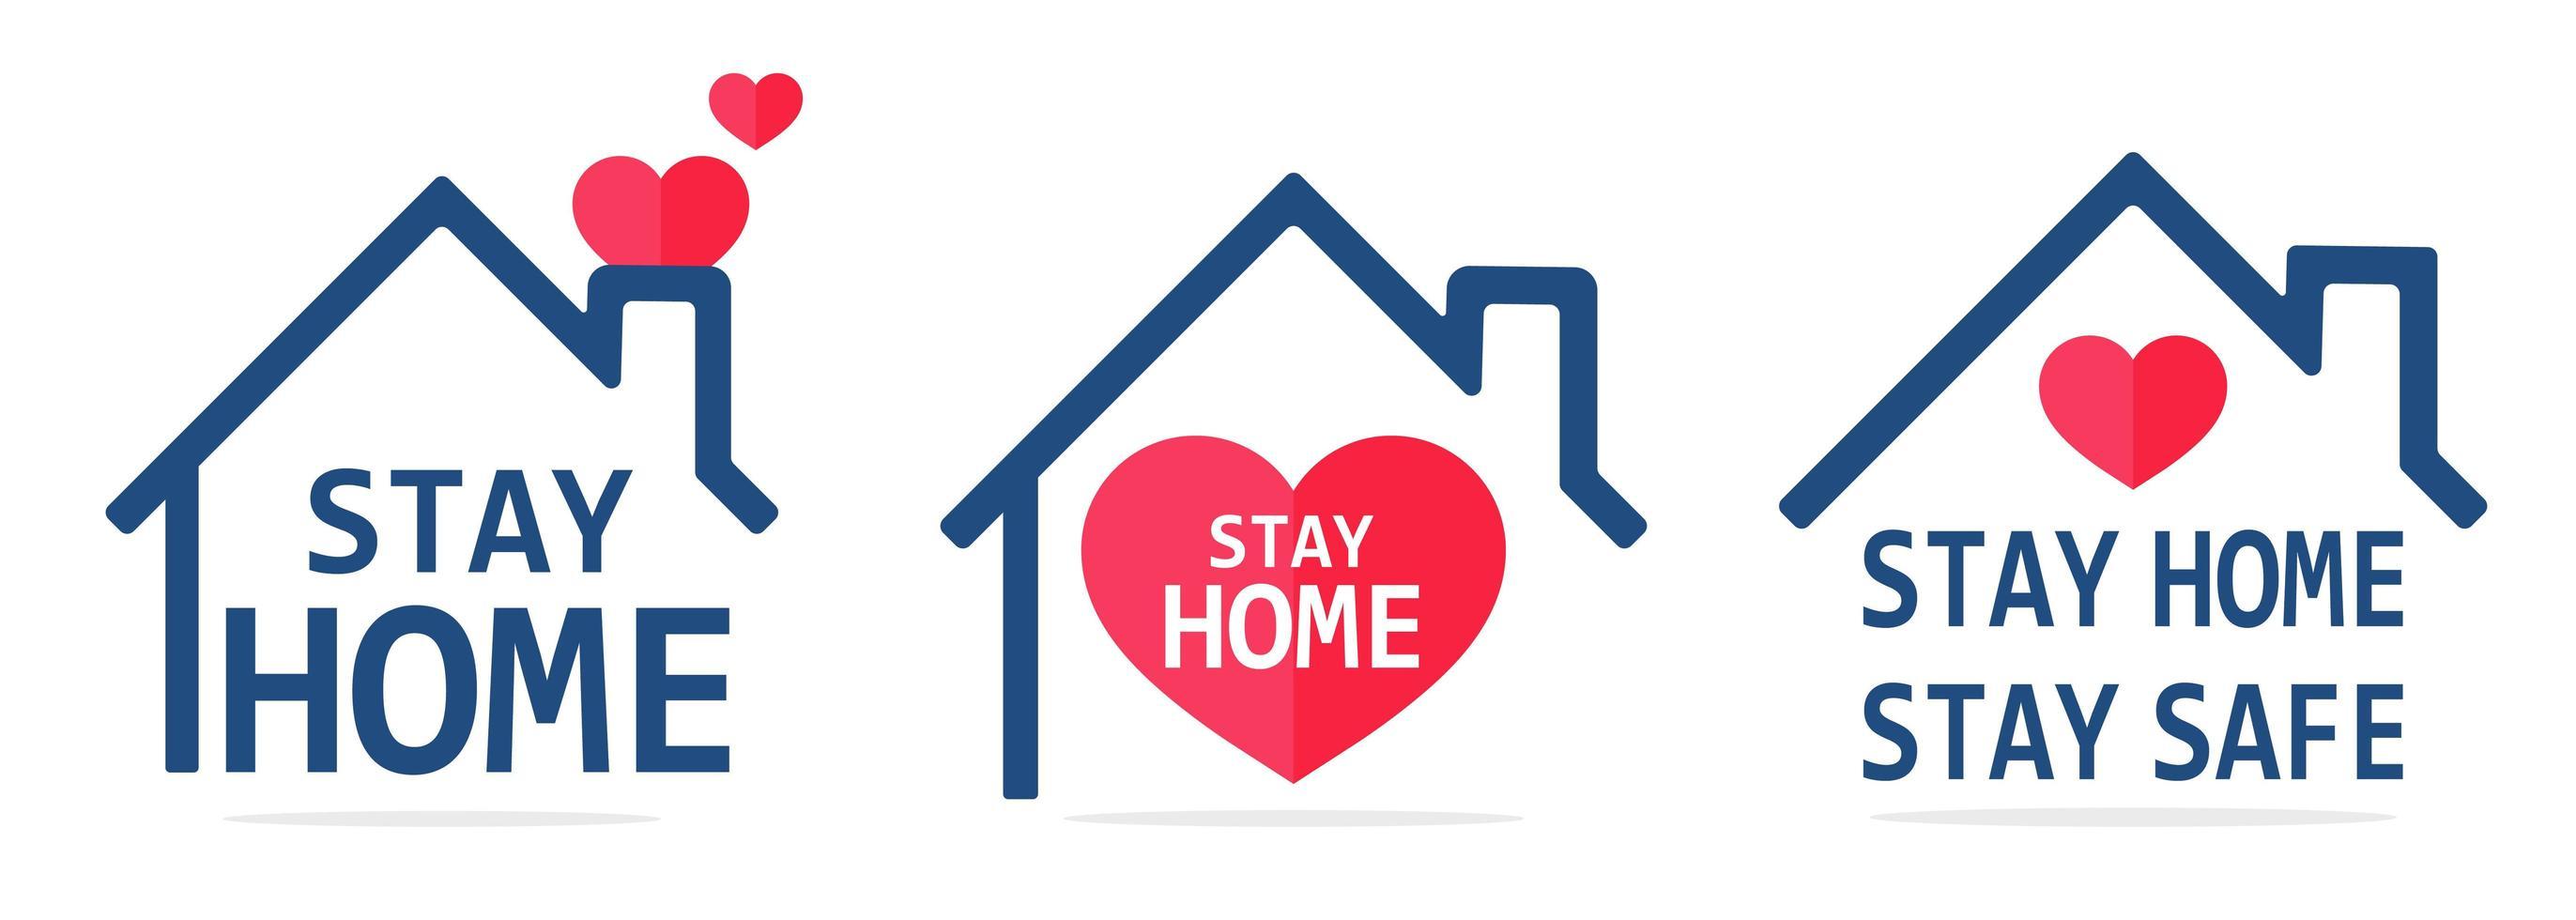 Bleib zu Hause Line Icon House vektor